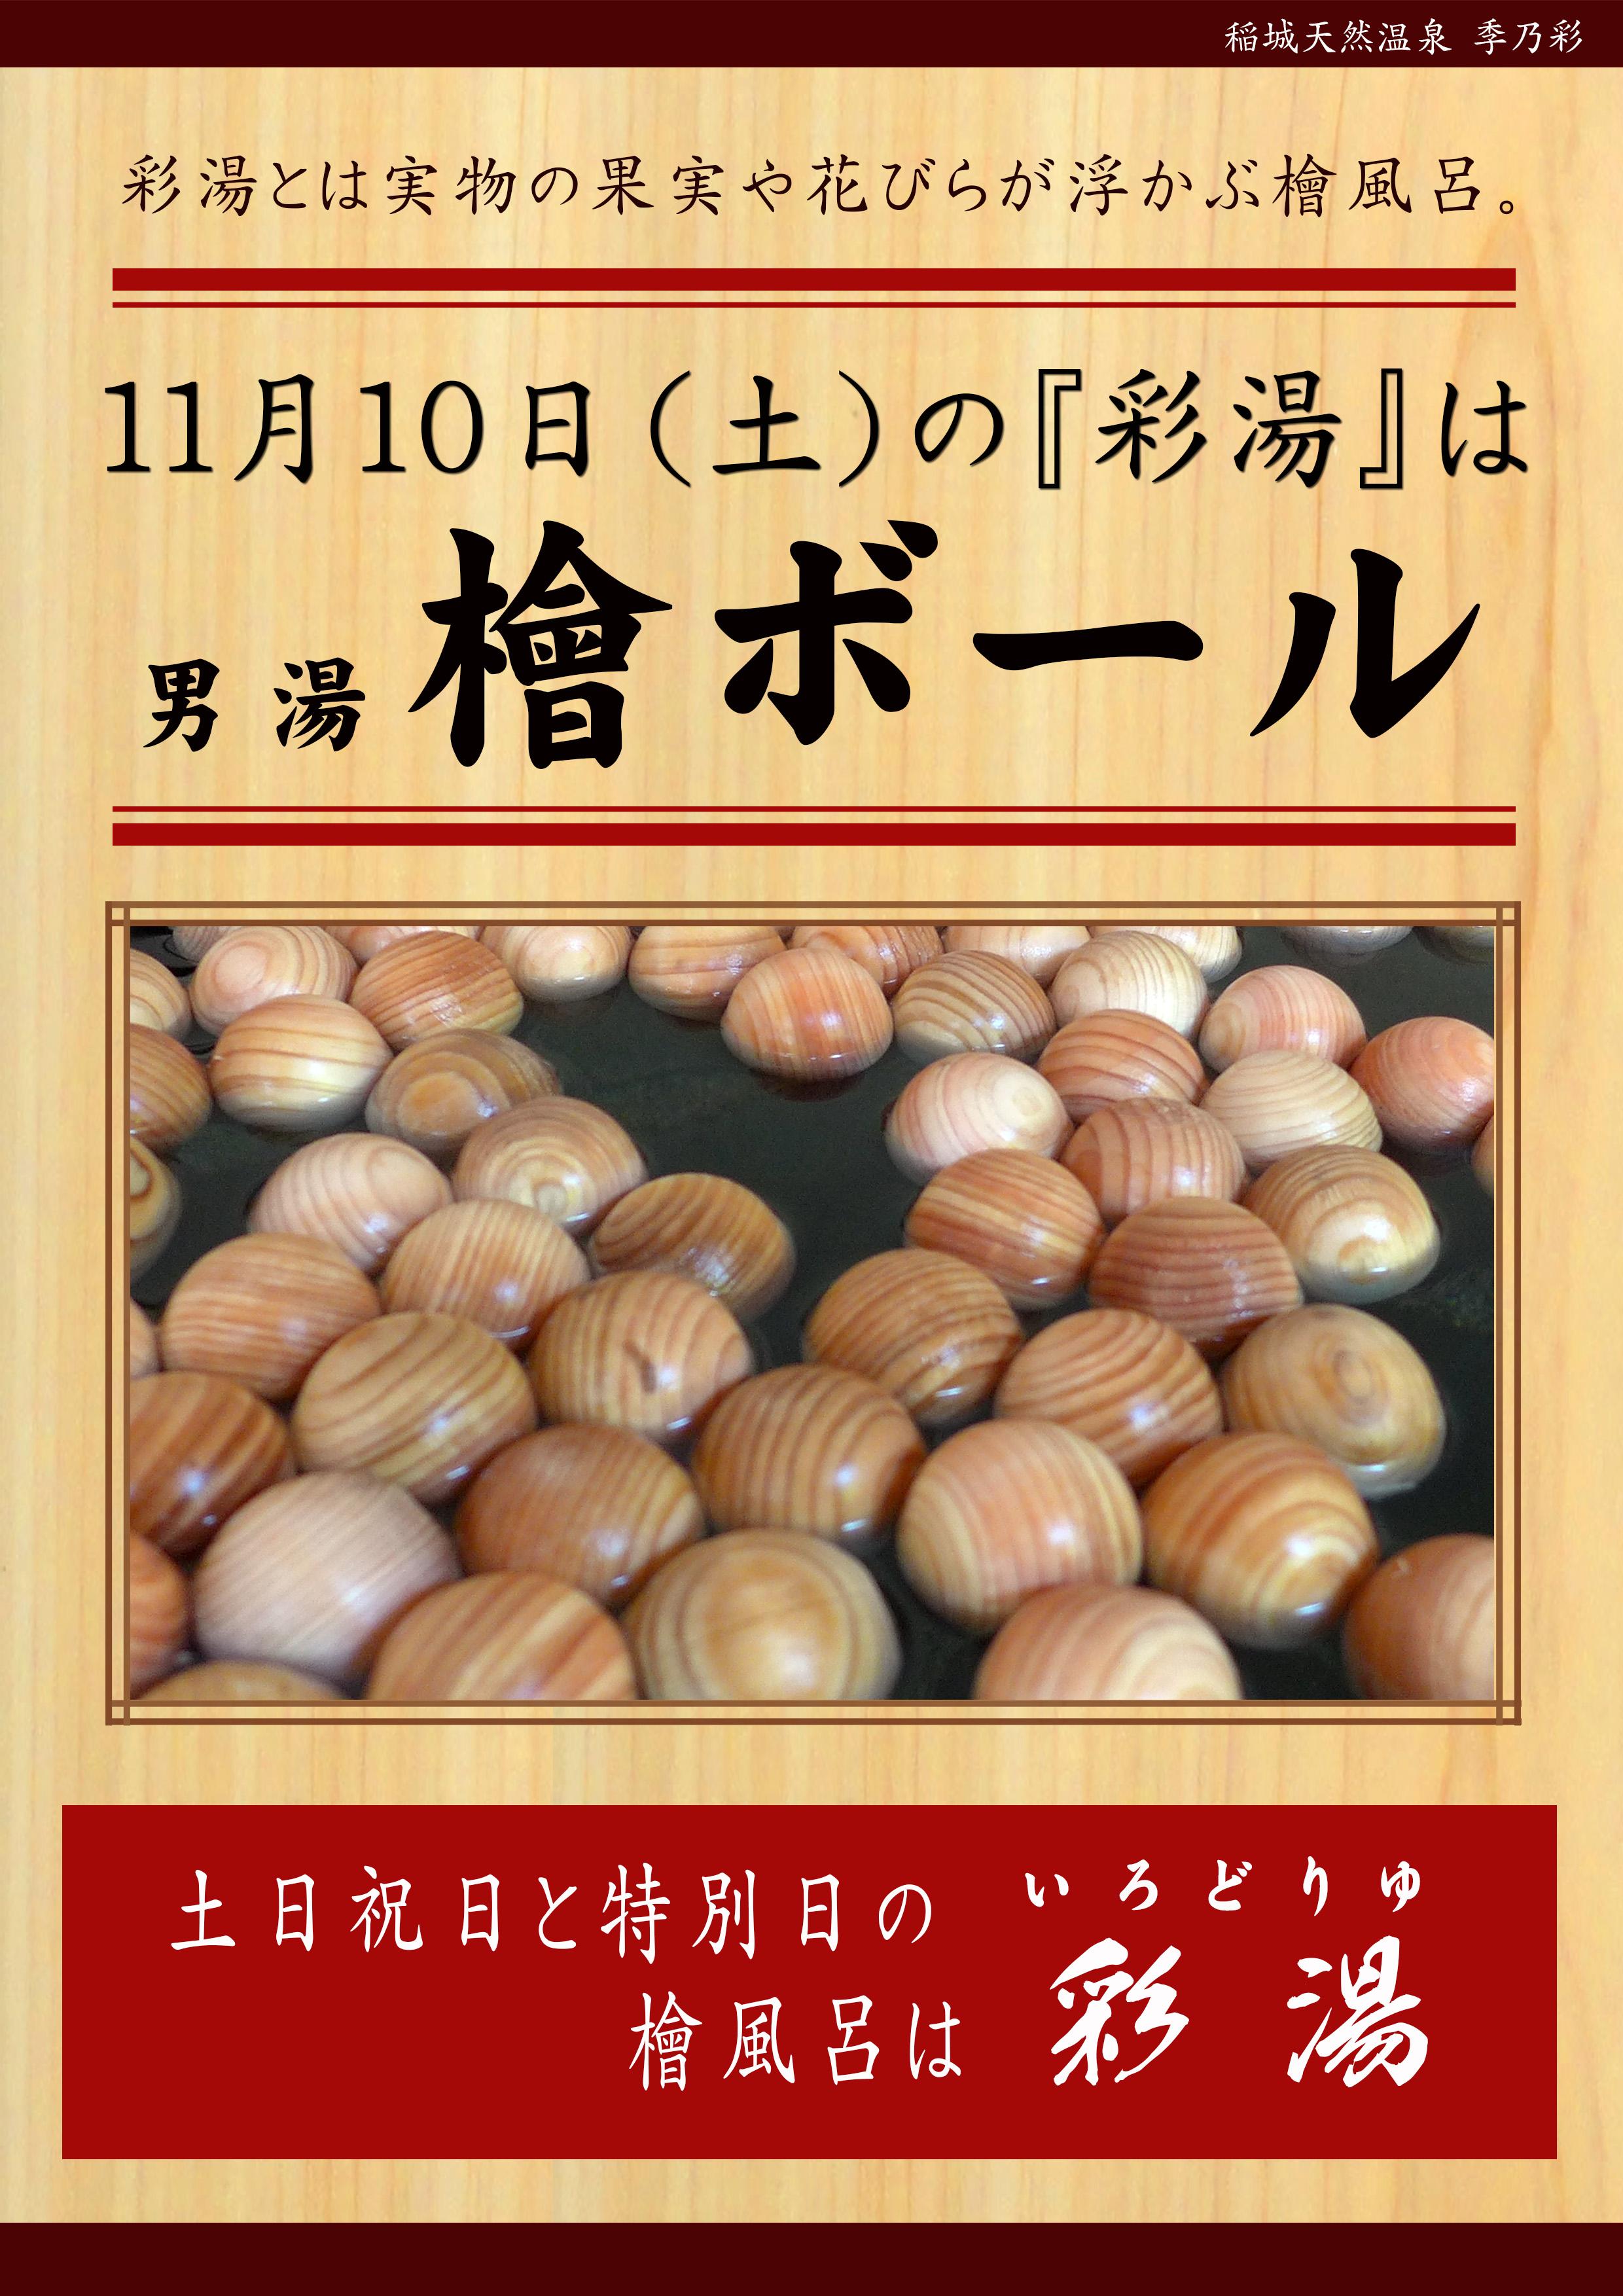 20181110POP イベント 彩湯 男湯 檜ボール